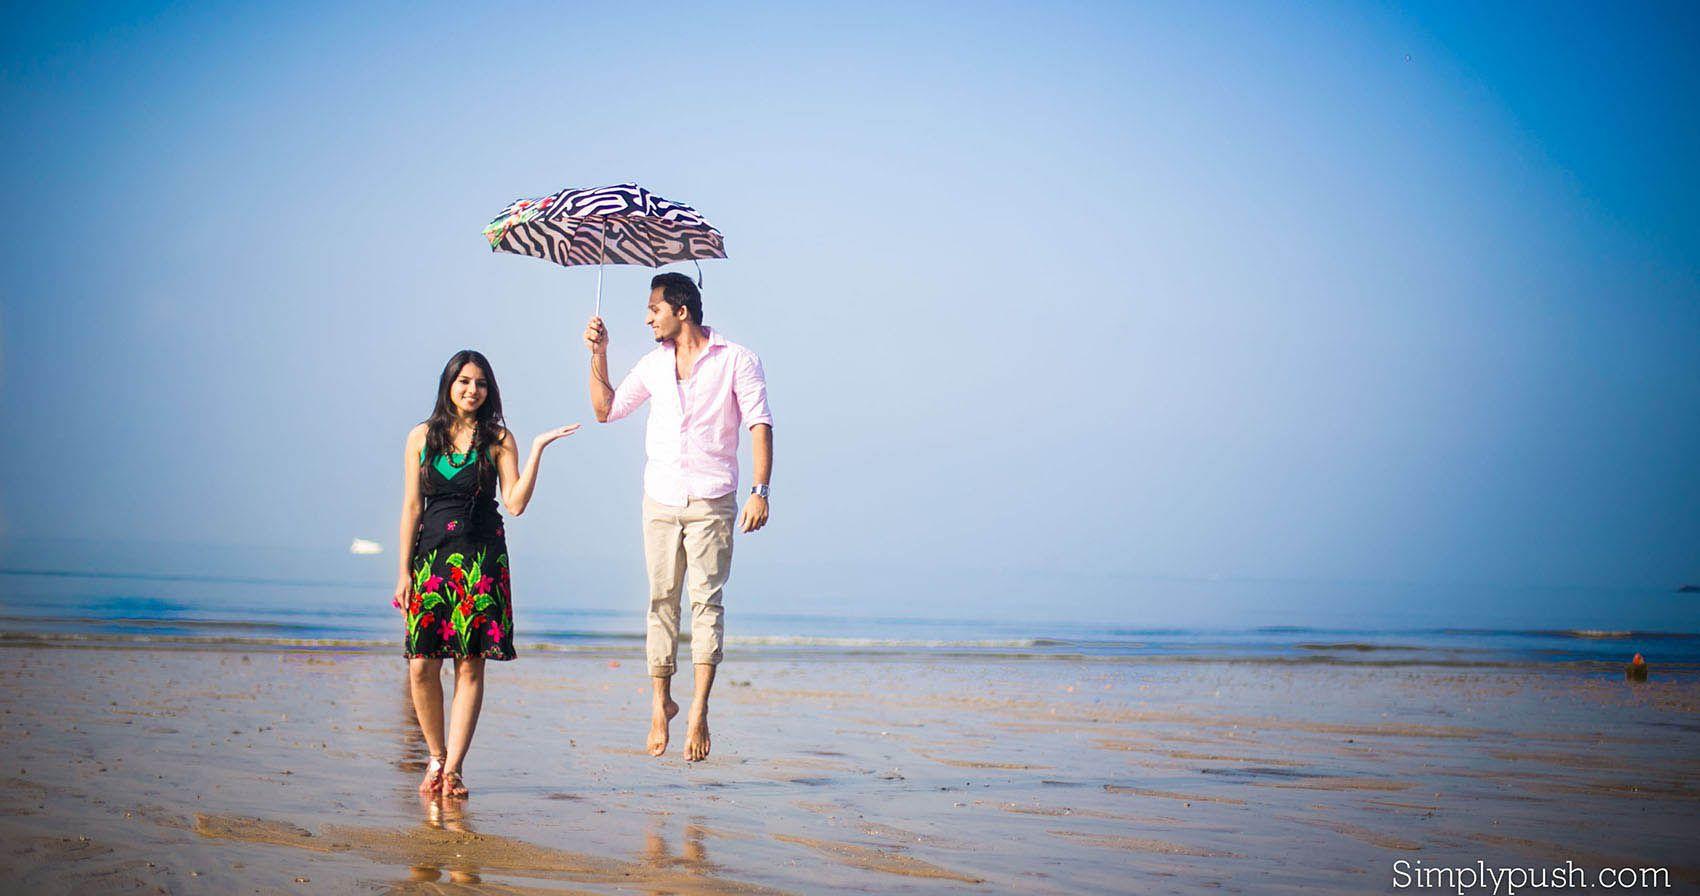 Bombay Pre Wedding Shoot Jpg 1700 896 Wedding Photography